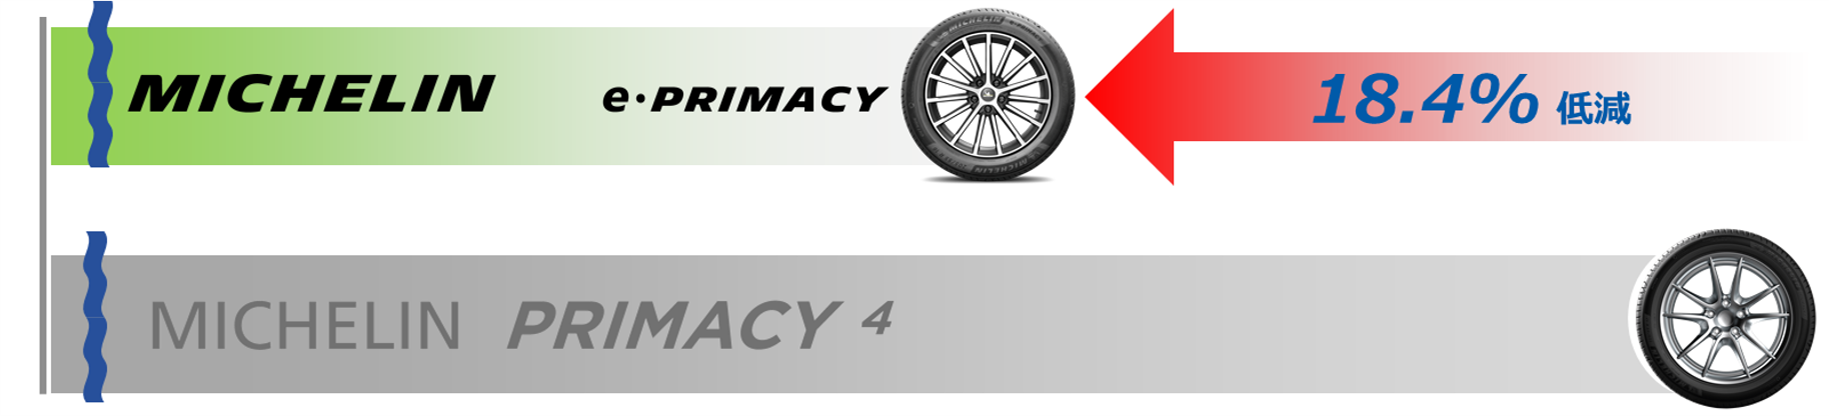 MICHELIN PRIMACY 4対比で転がり抵抗を18.4%低減